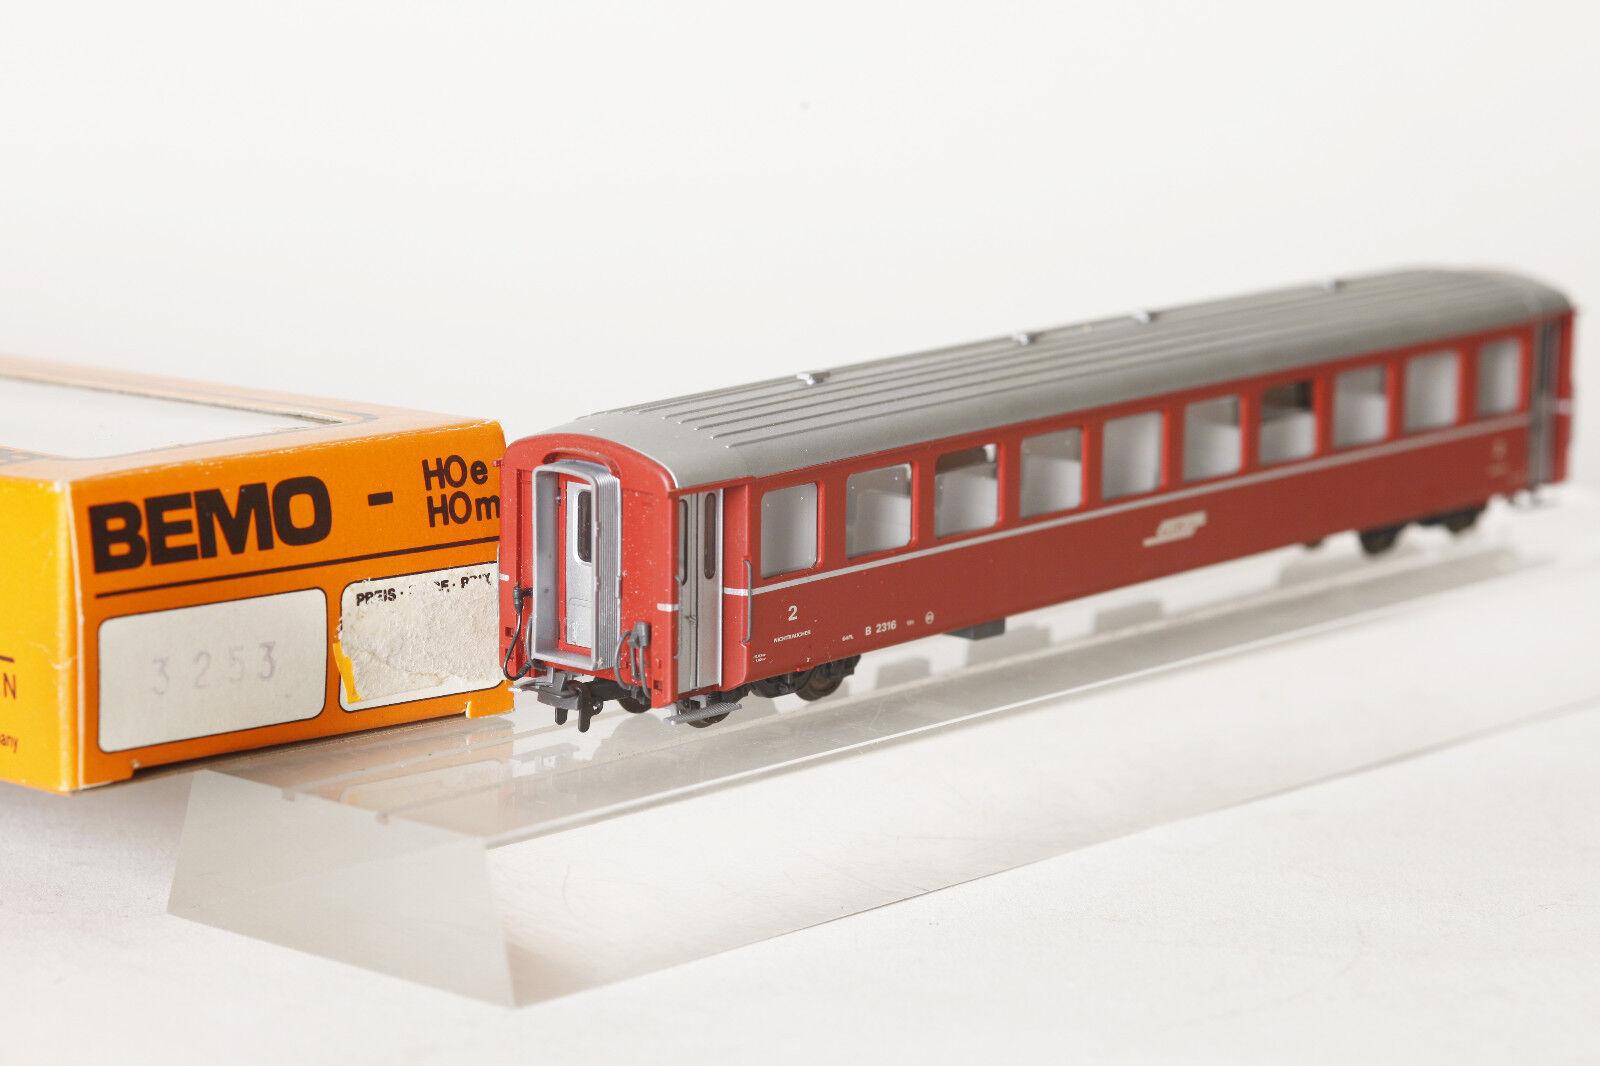 BEMO h0m 3253 126 persone carrello RHB Rhätische Bahn B 2316 EW I 2.kl. ROSSO  72113